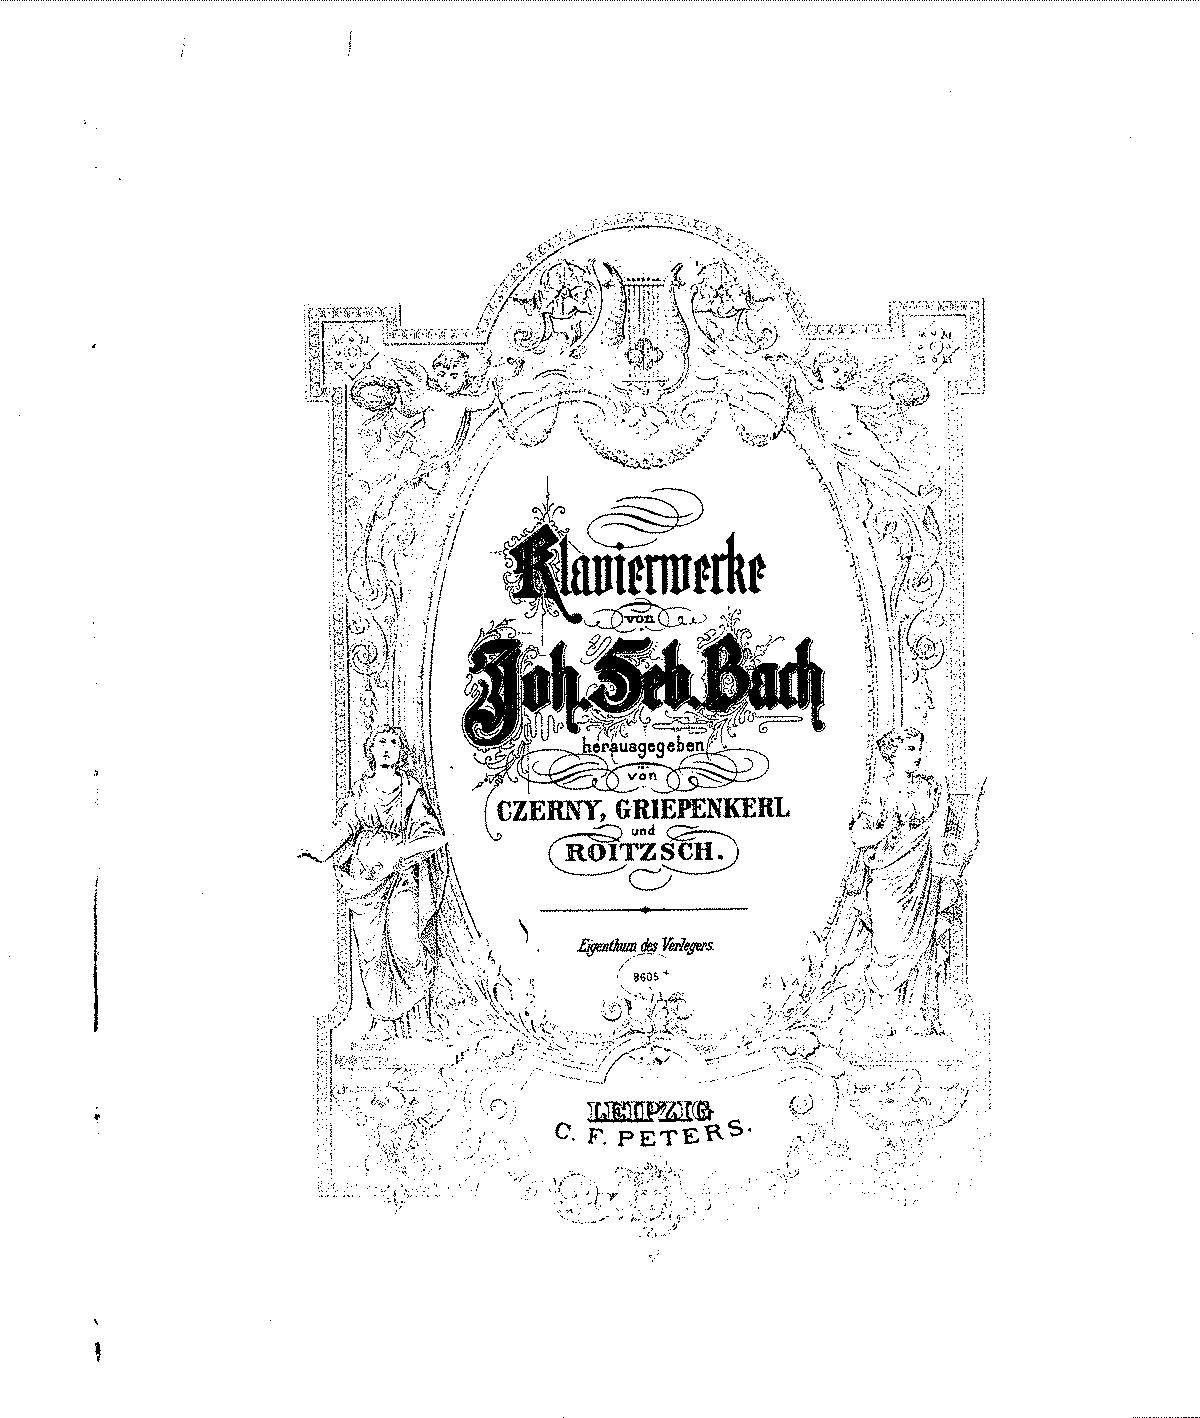 Fantasia and Fugue in C minor, BWV 906 (Bach, Johann